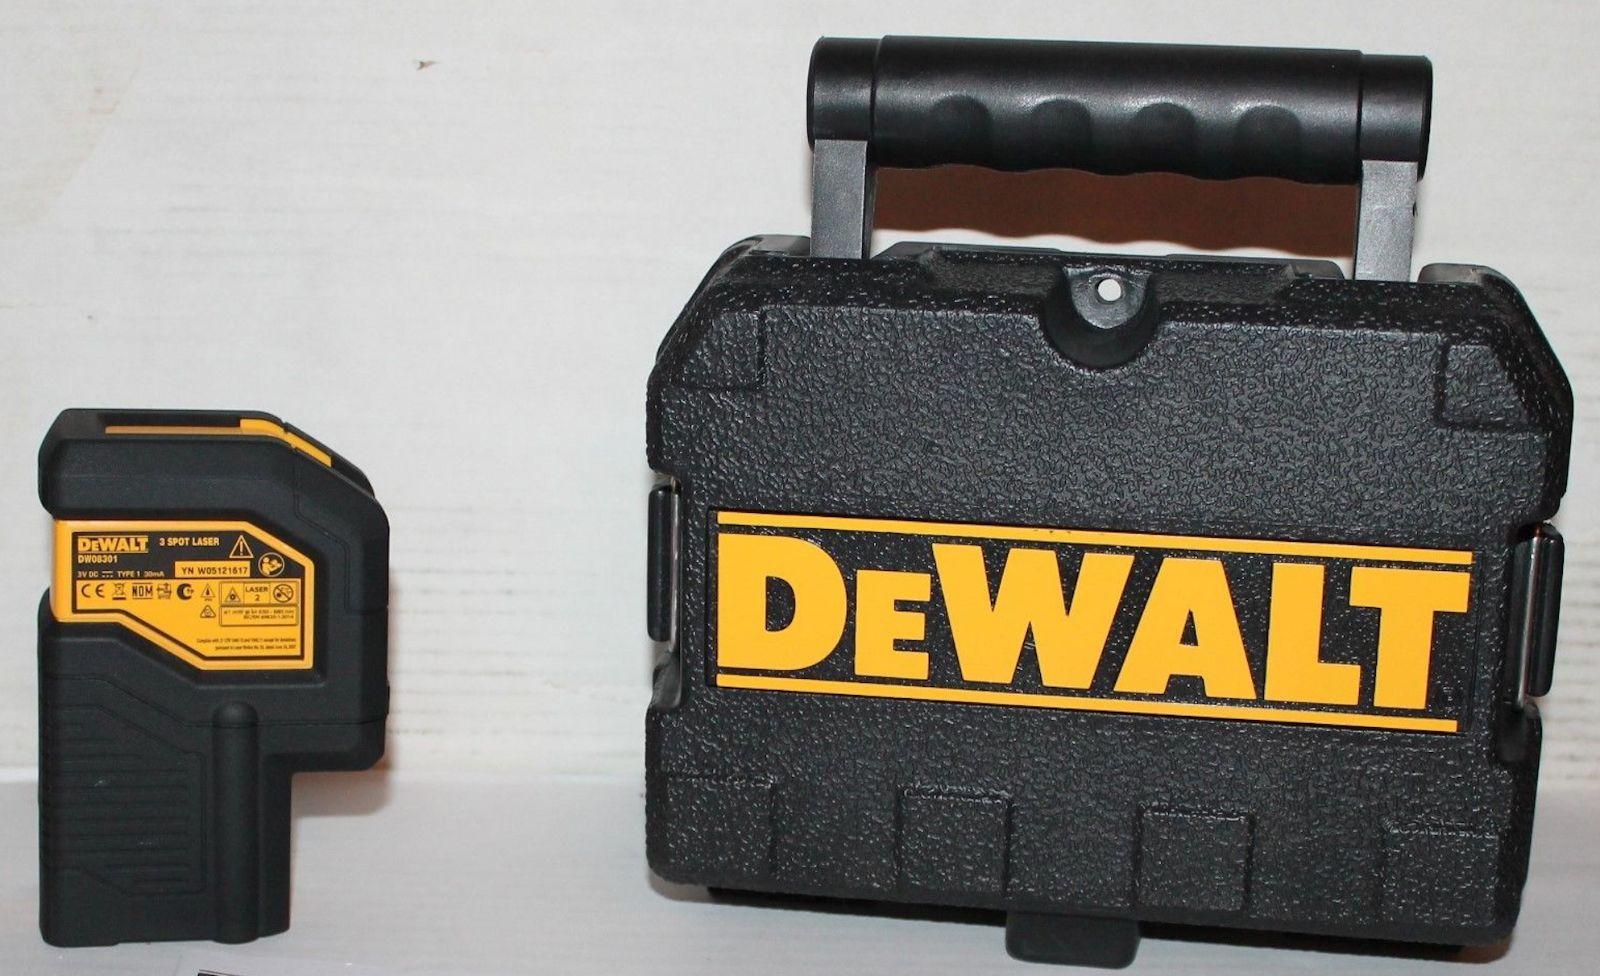 Laser Measuring Tools 126396 Dewalt Dw08301 100 Feet Self Leveling 3 Beam Laser Pointer Buy It Now Only 79 99 On Ebay Las Dewalt Laser Pointer Pointers